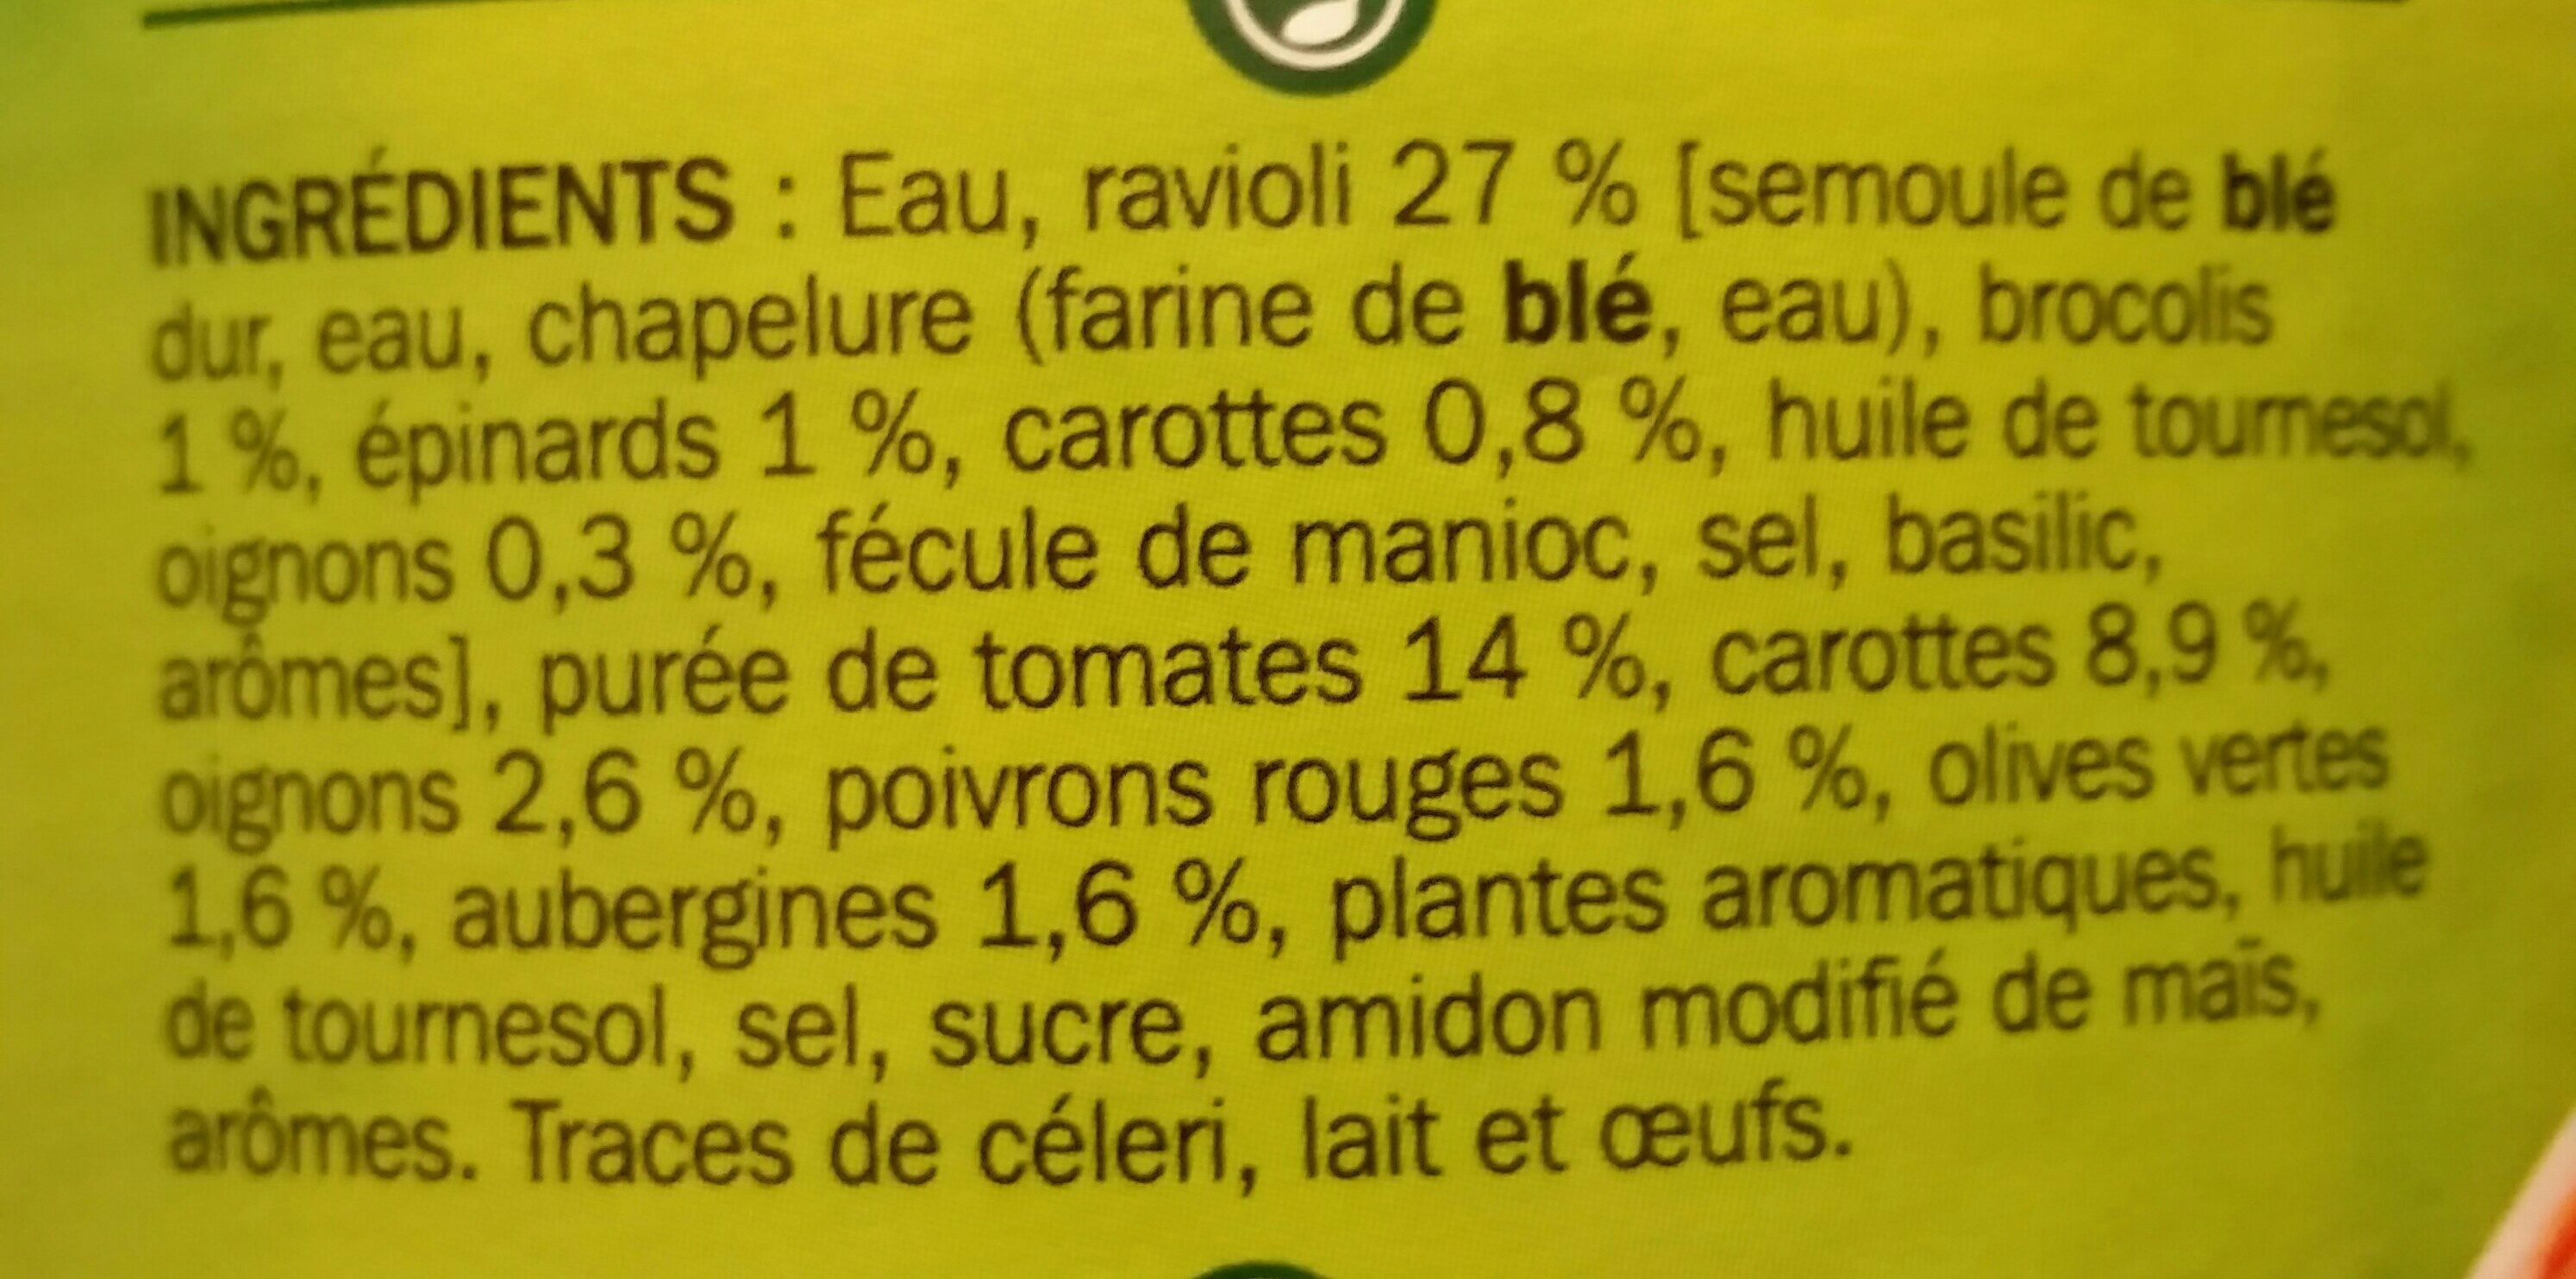 Raviolis aux 6 Légumes - Ingrédients - fr